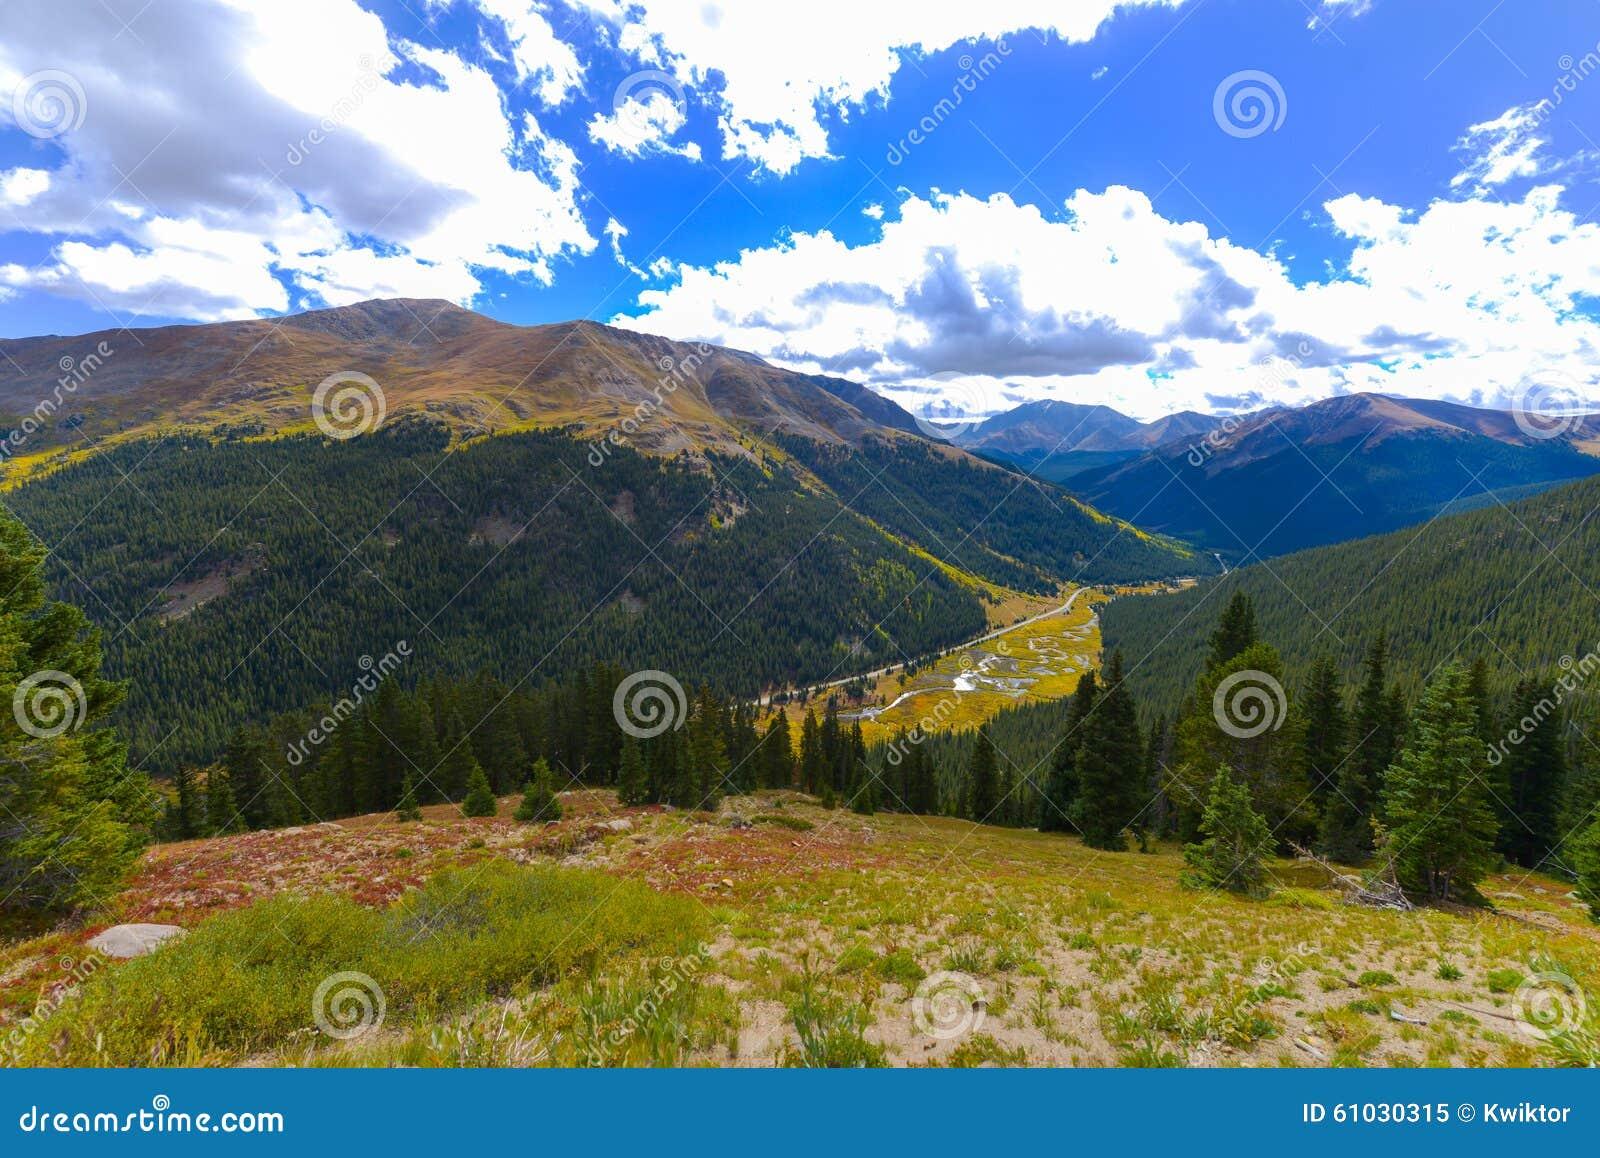 Independence Pass Colorado